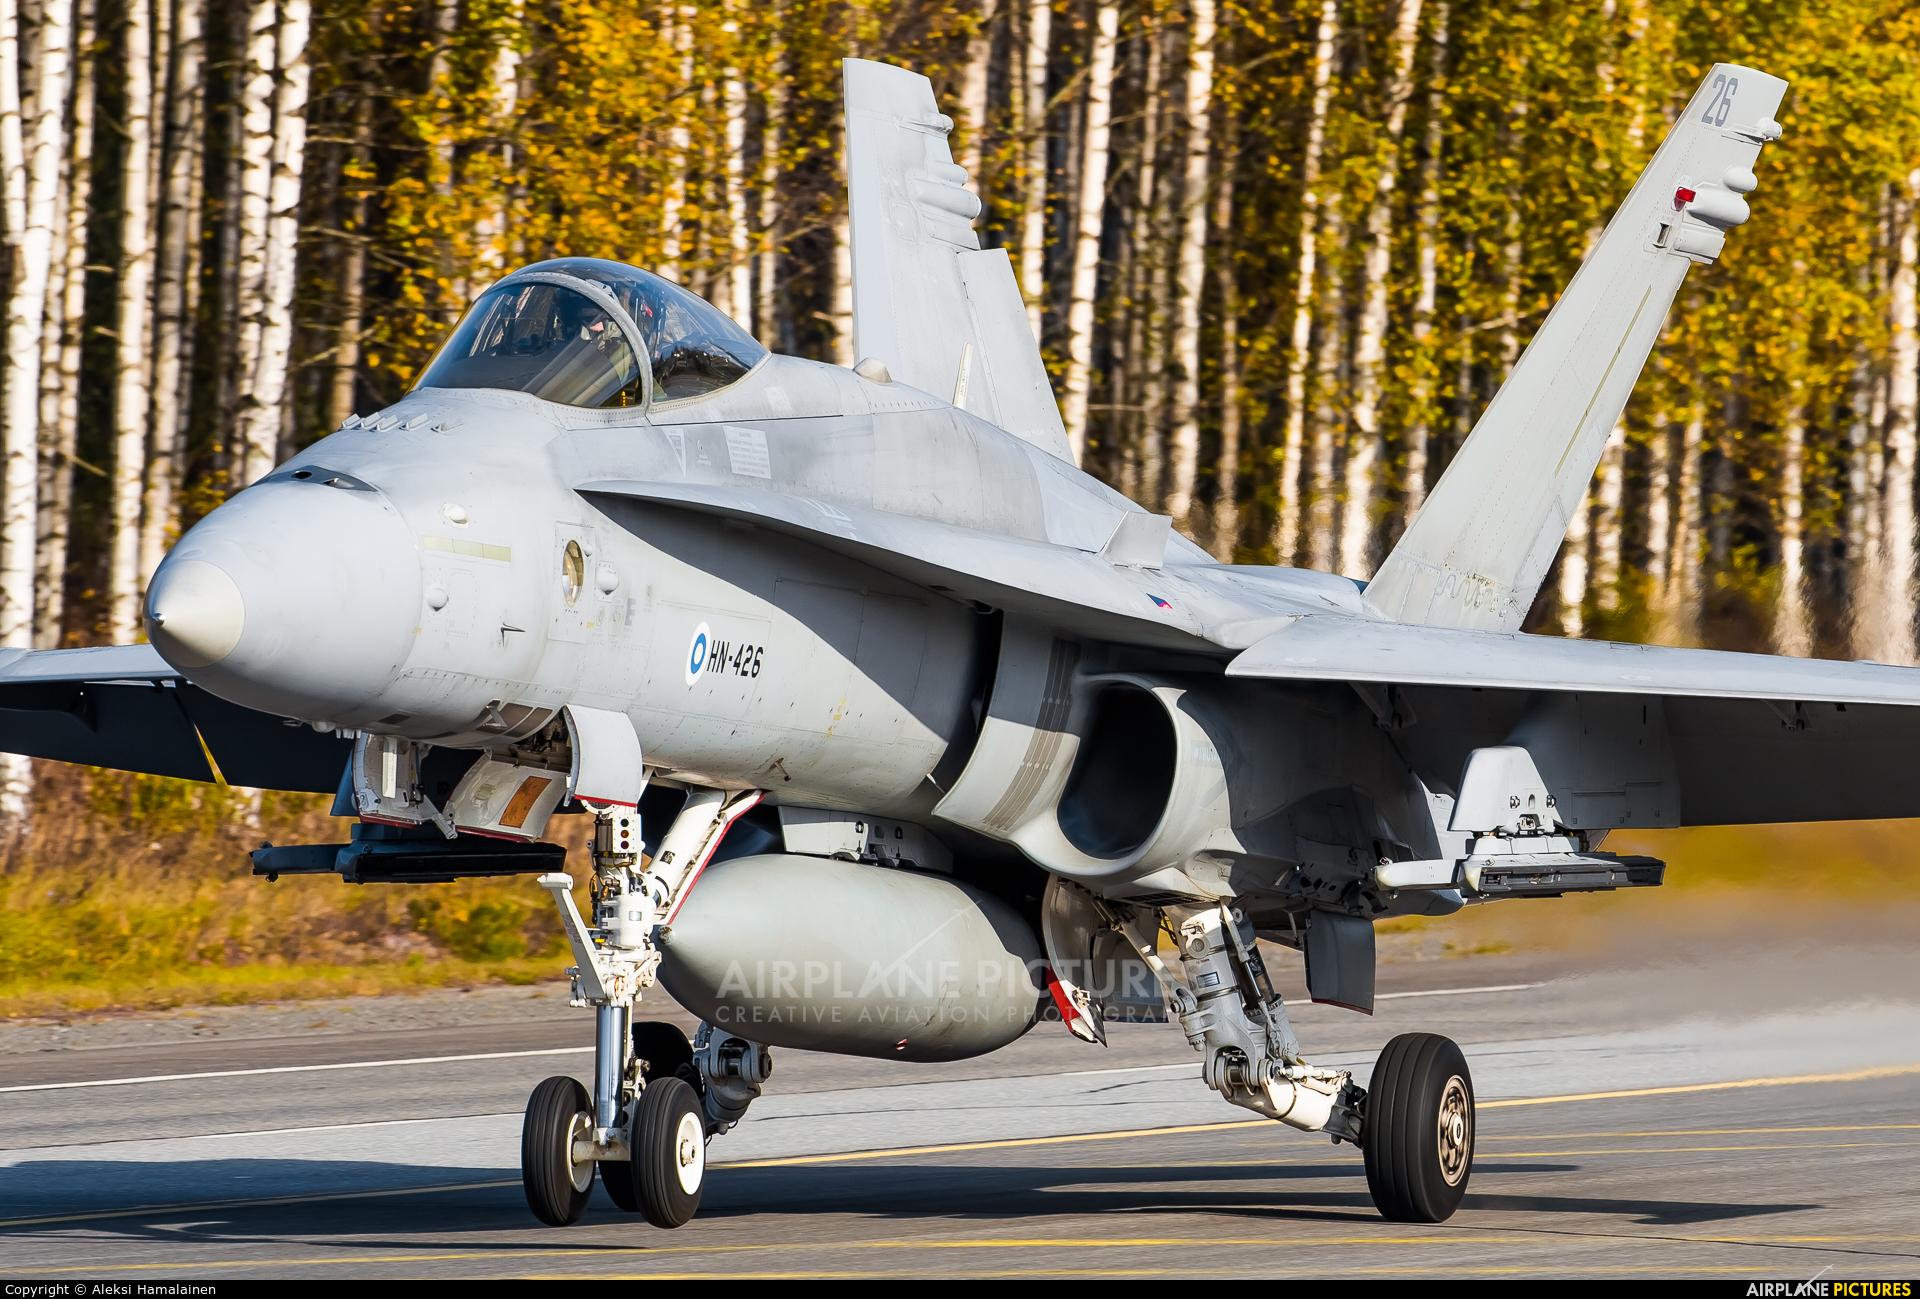 Finland - Air Force HN-426 aircraft at Off Airport - Lusi Highway Strip